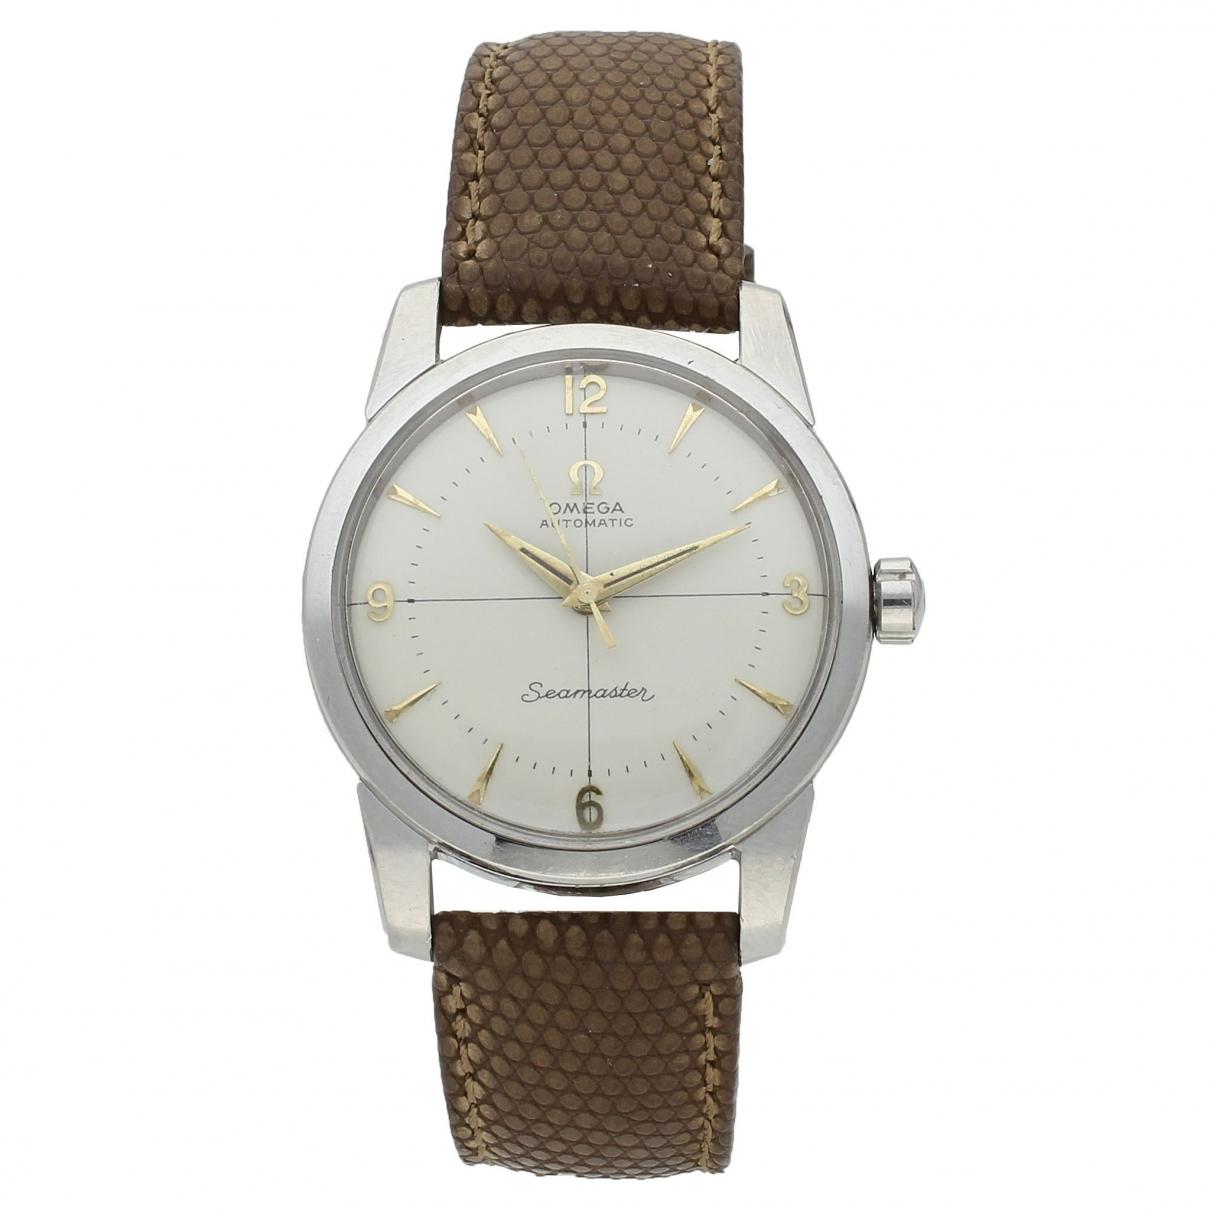 Omega Seamaster Uhr in  Gold Stahl